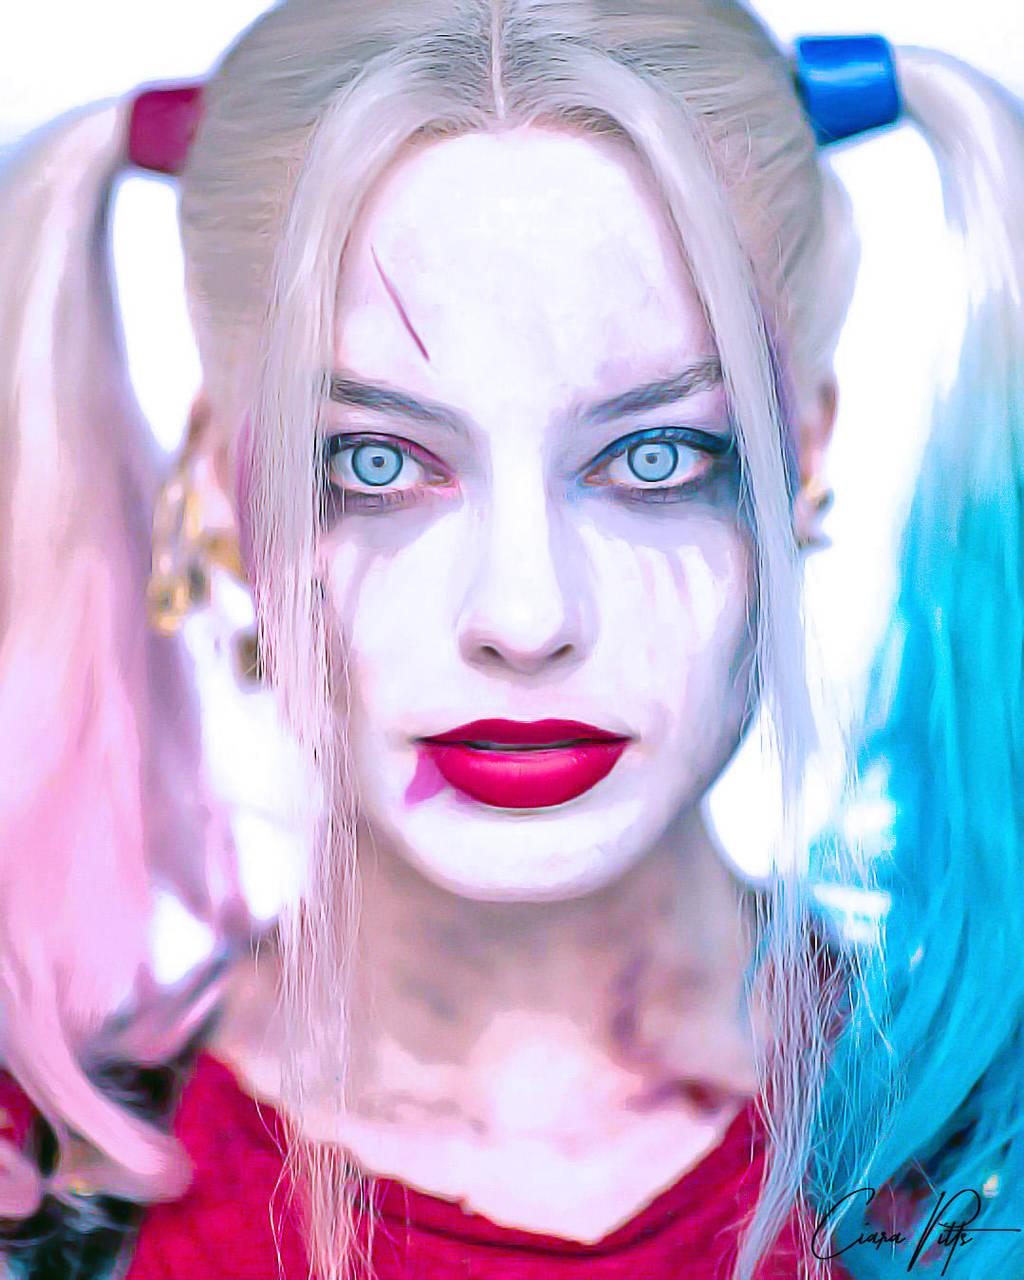 Harley Quinn Digital Painting By Designbyciara On Deviantart